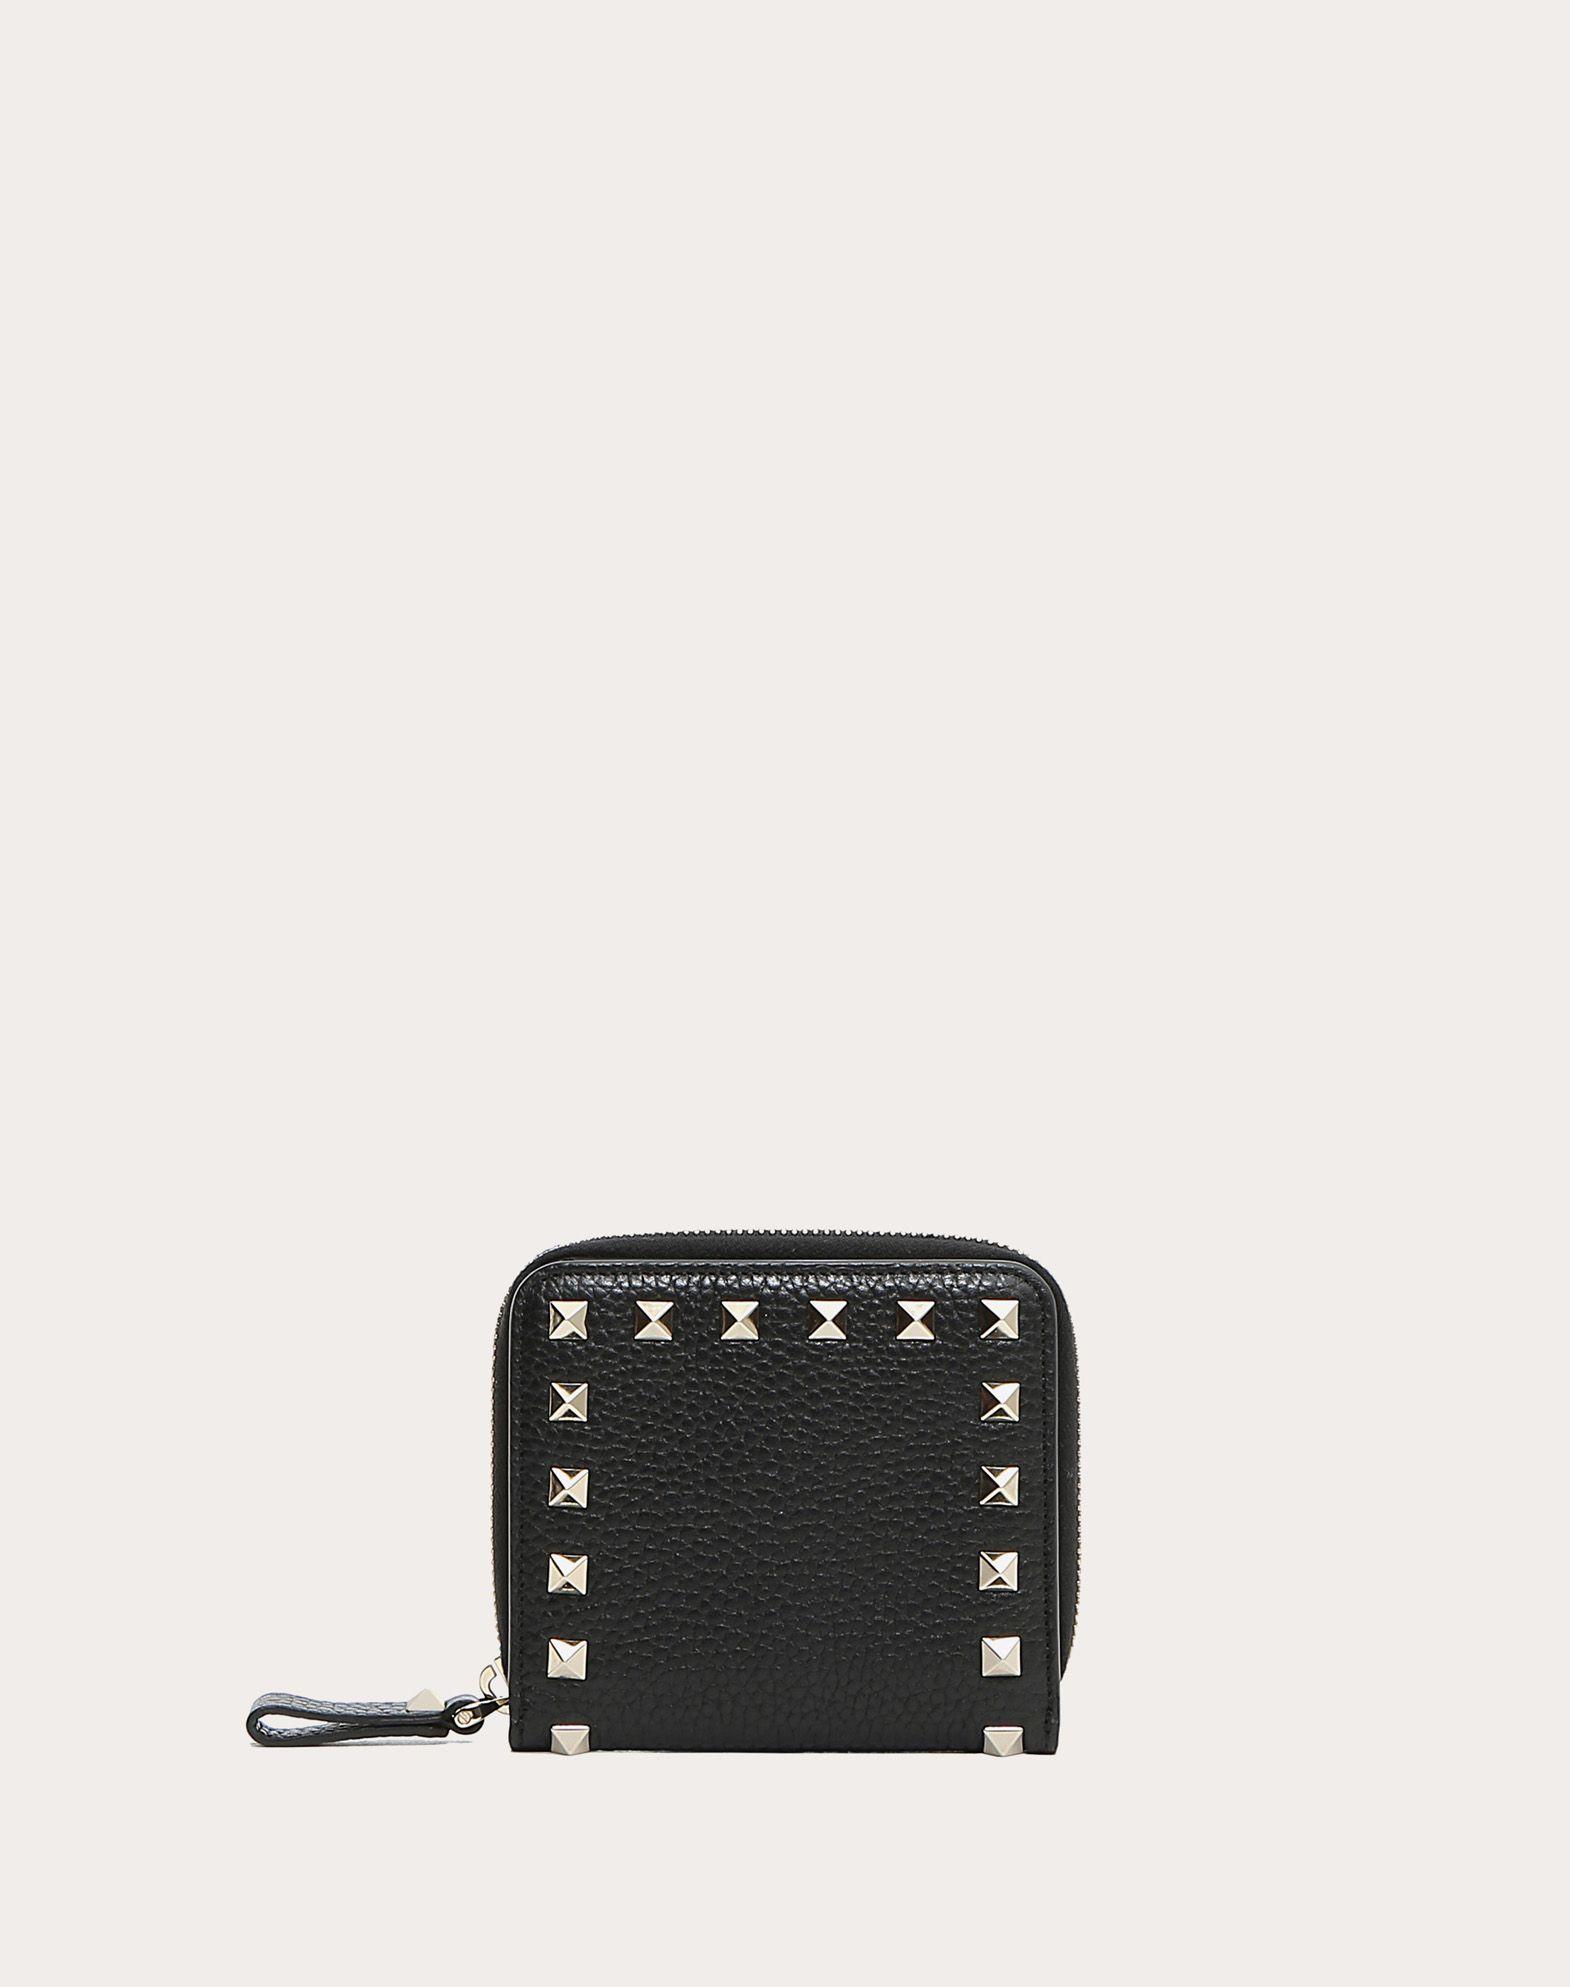 Rockstud Compact Wallet